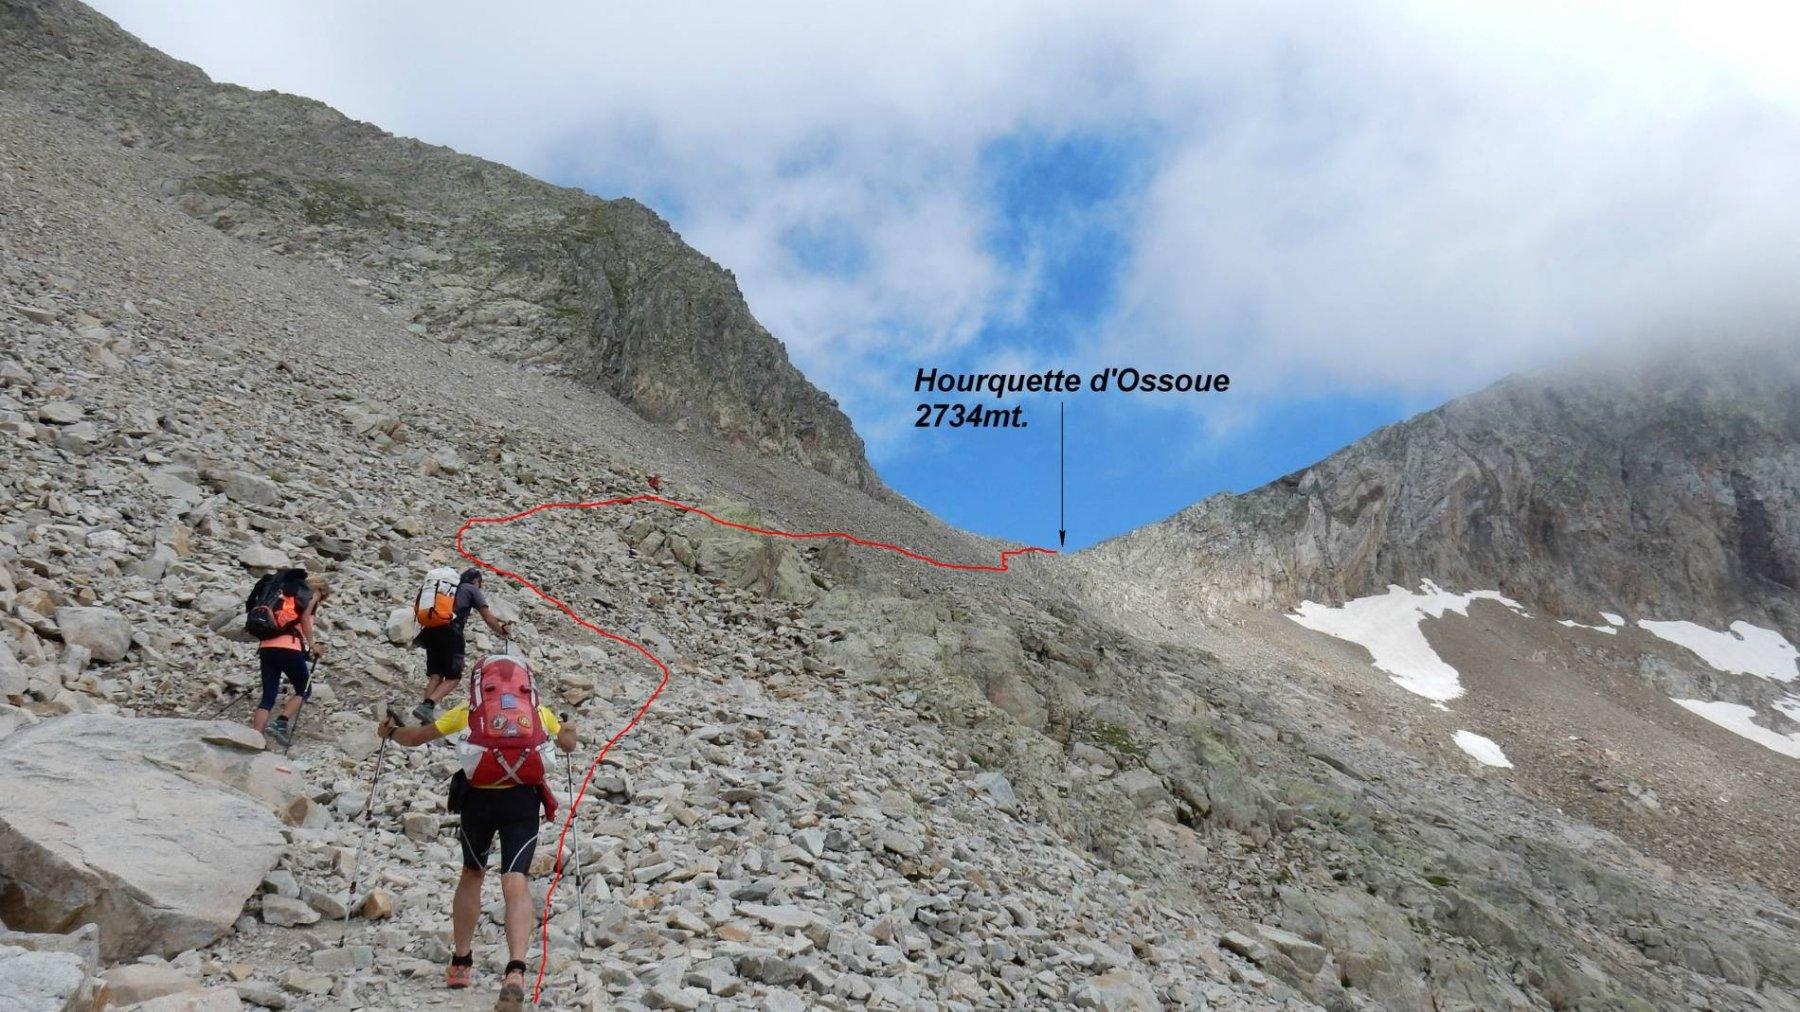 Trek Pirenei Ordesa Gavarnie tappa 2: dal Ref.Oulettes de Gaube al Ref. de Bayssellance 2016-08-10